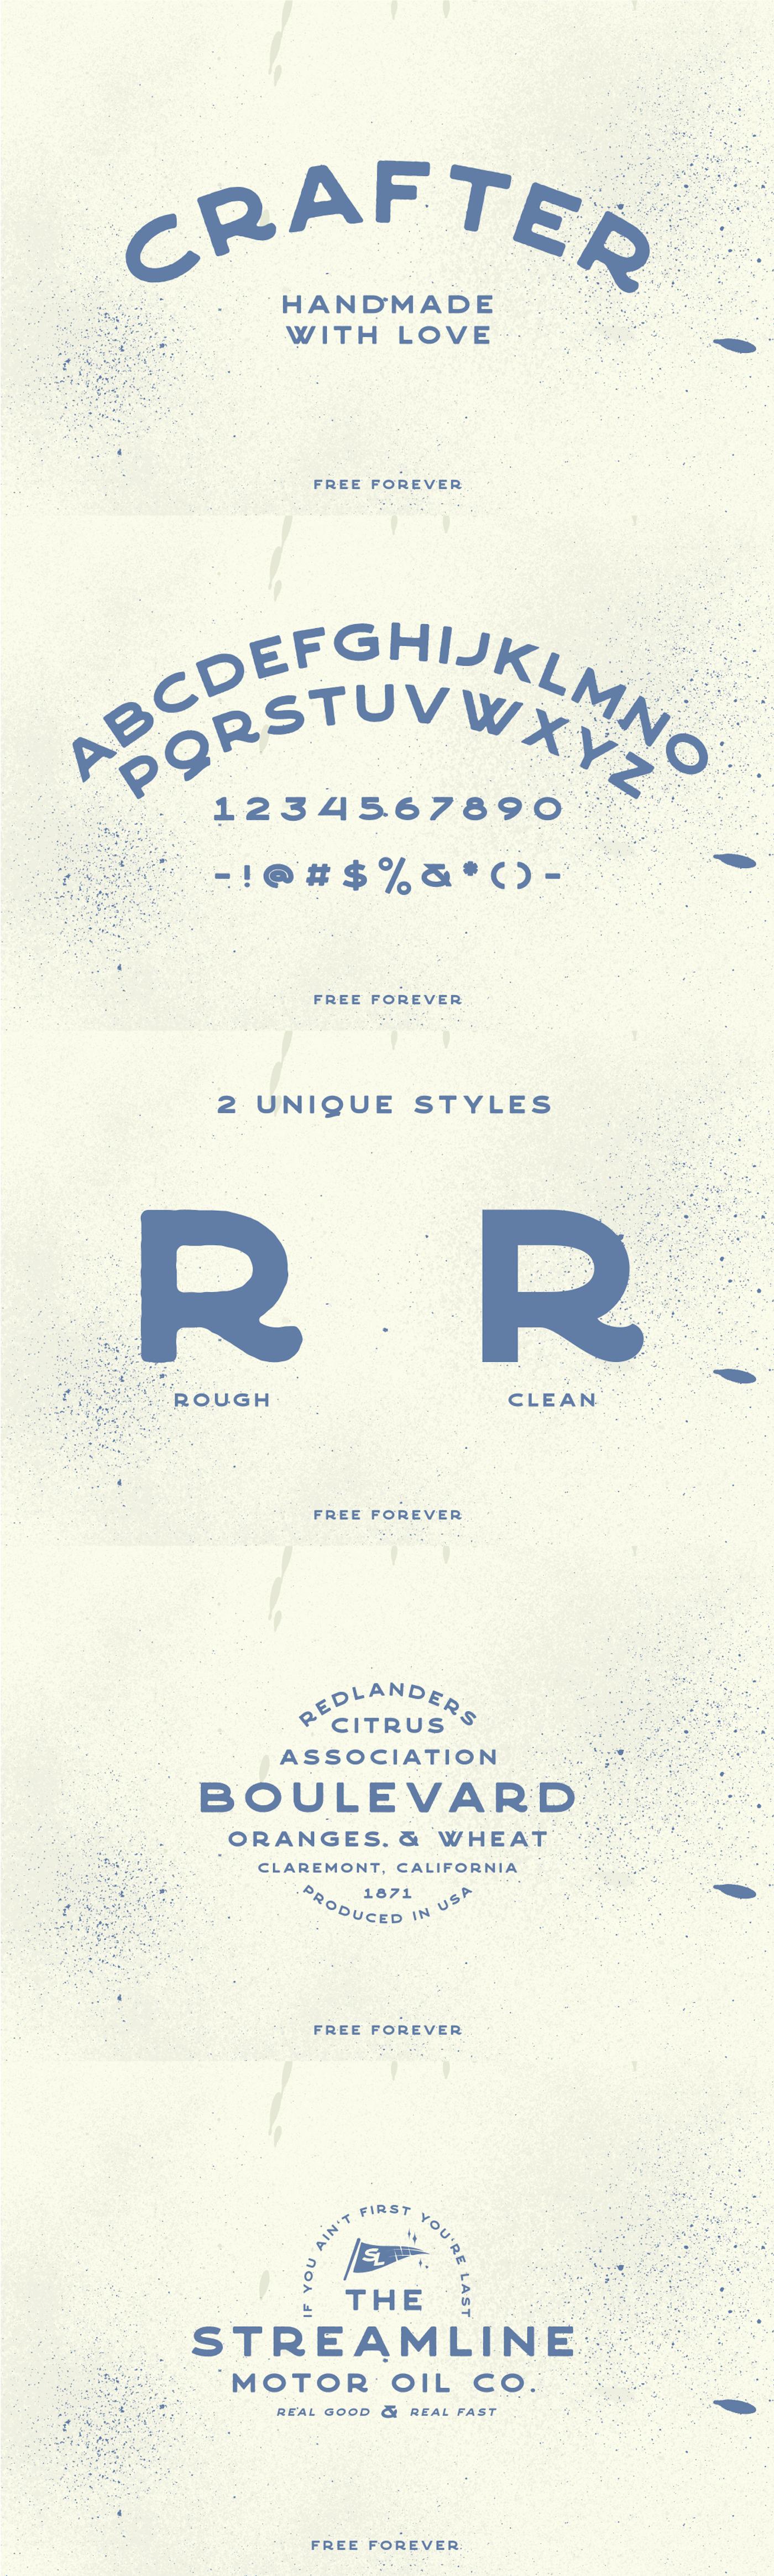 Free font free fonts free freebie font fonts type Typeface vintage commercial